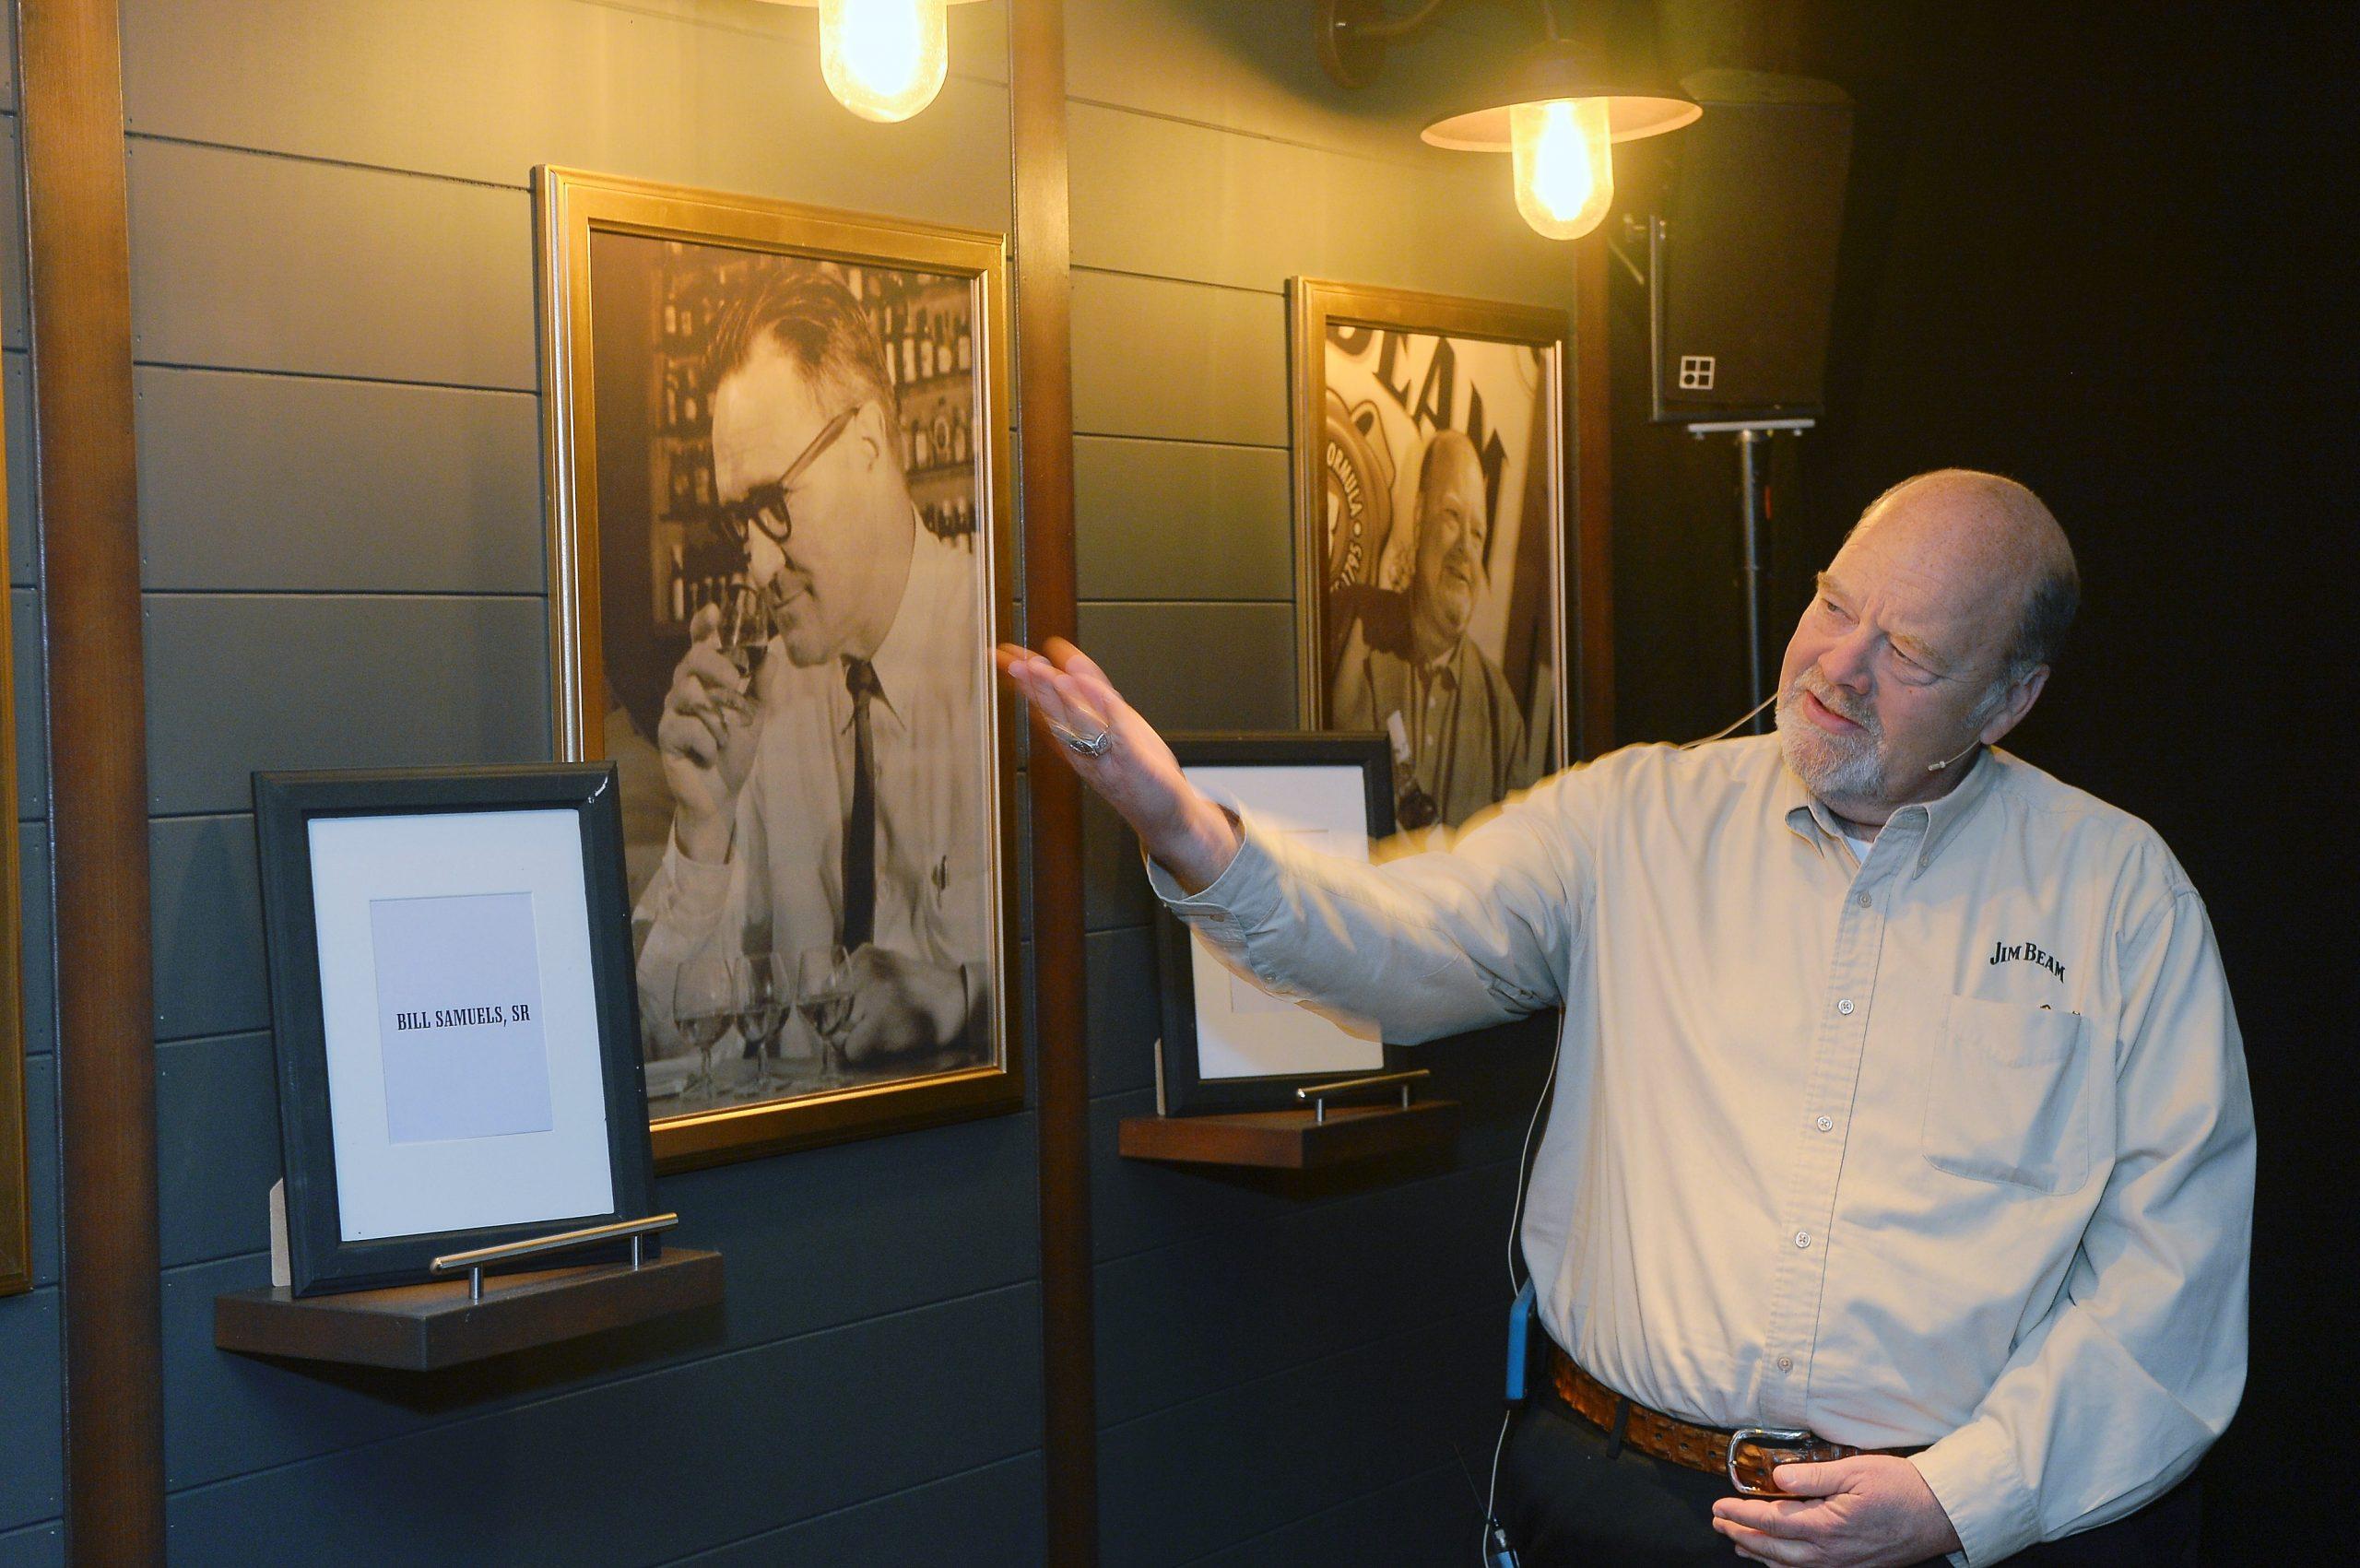 Master-Distiller Fred Noe im Gespräch